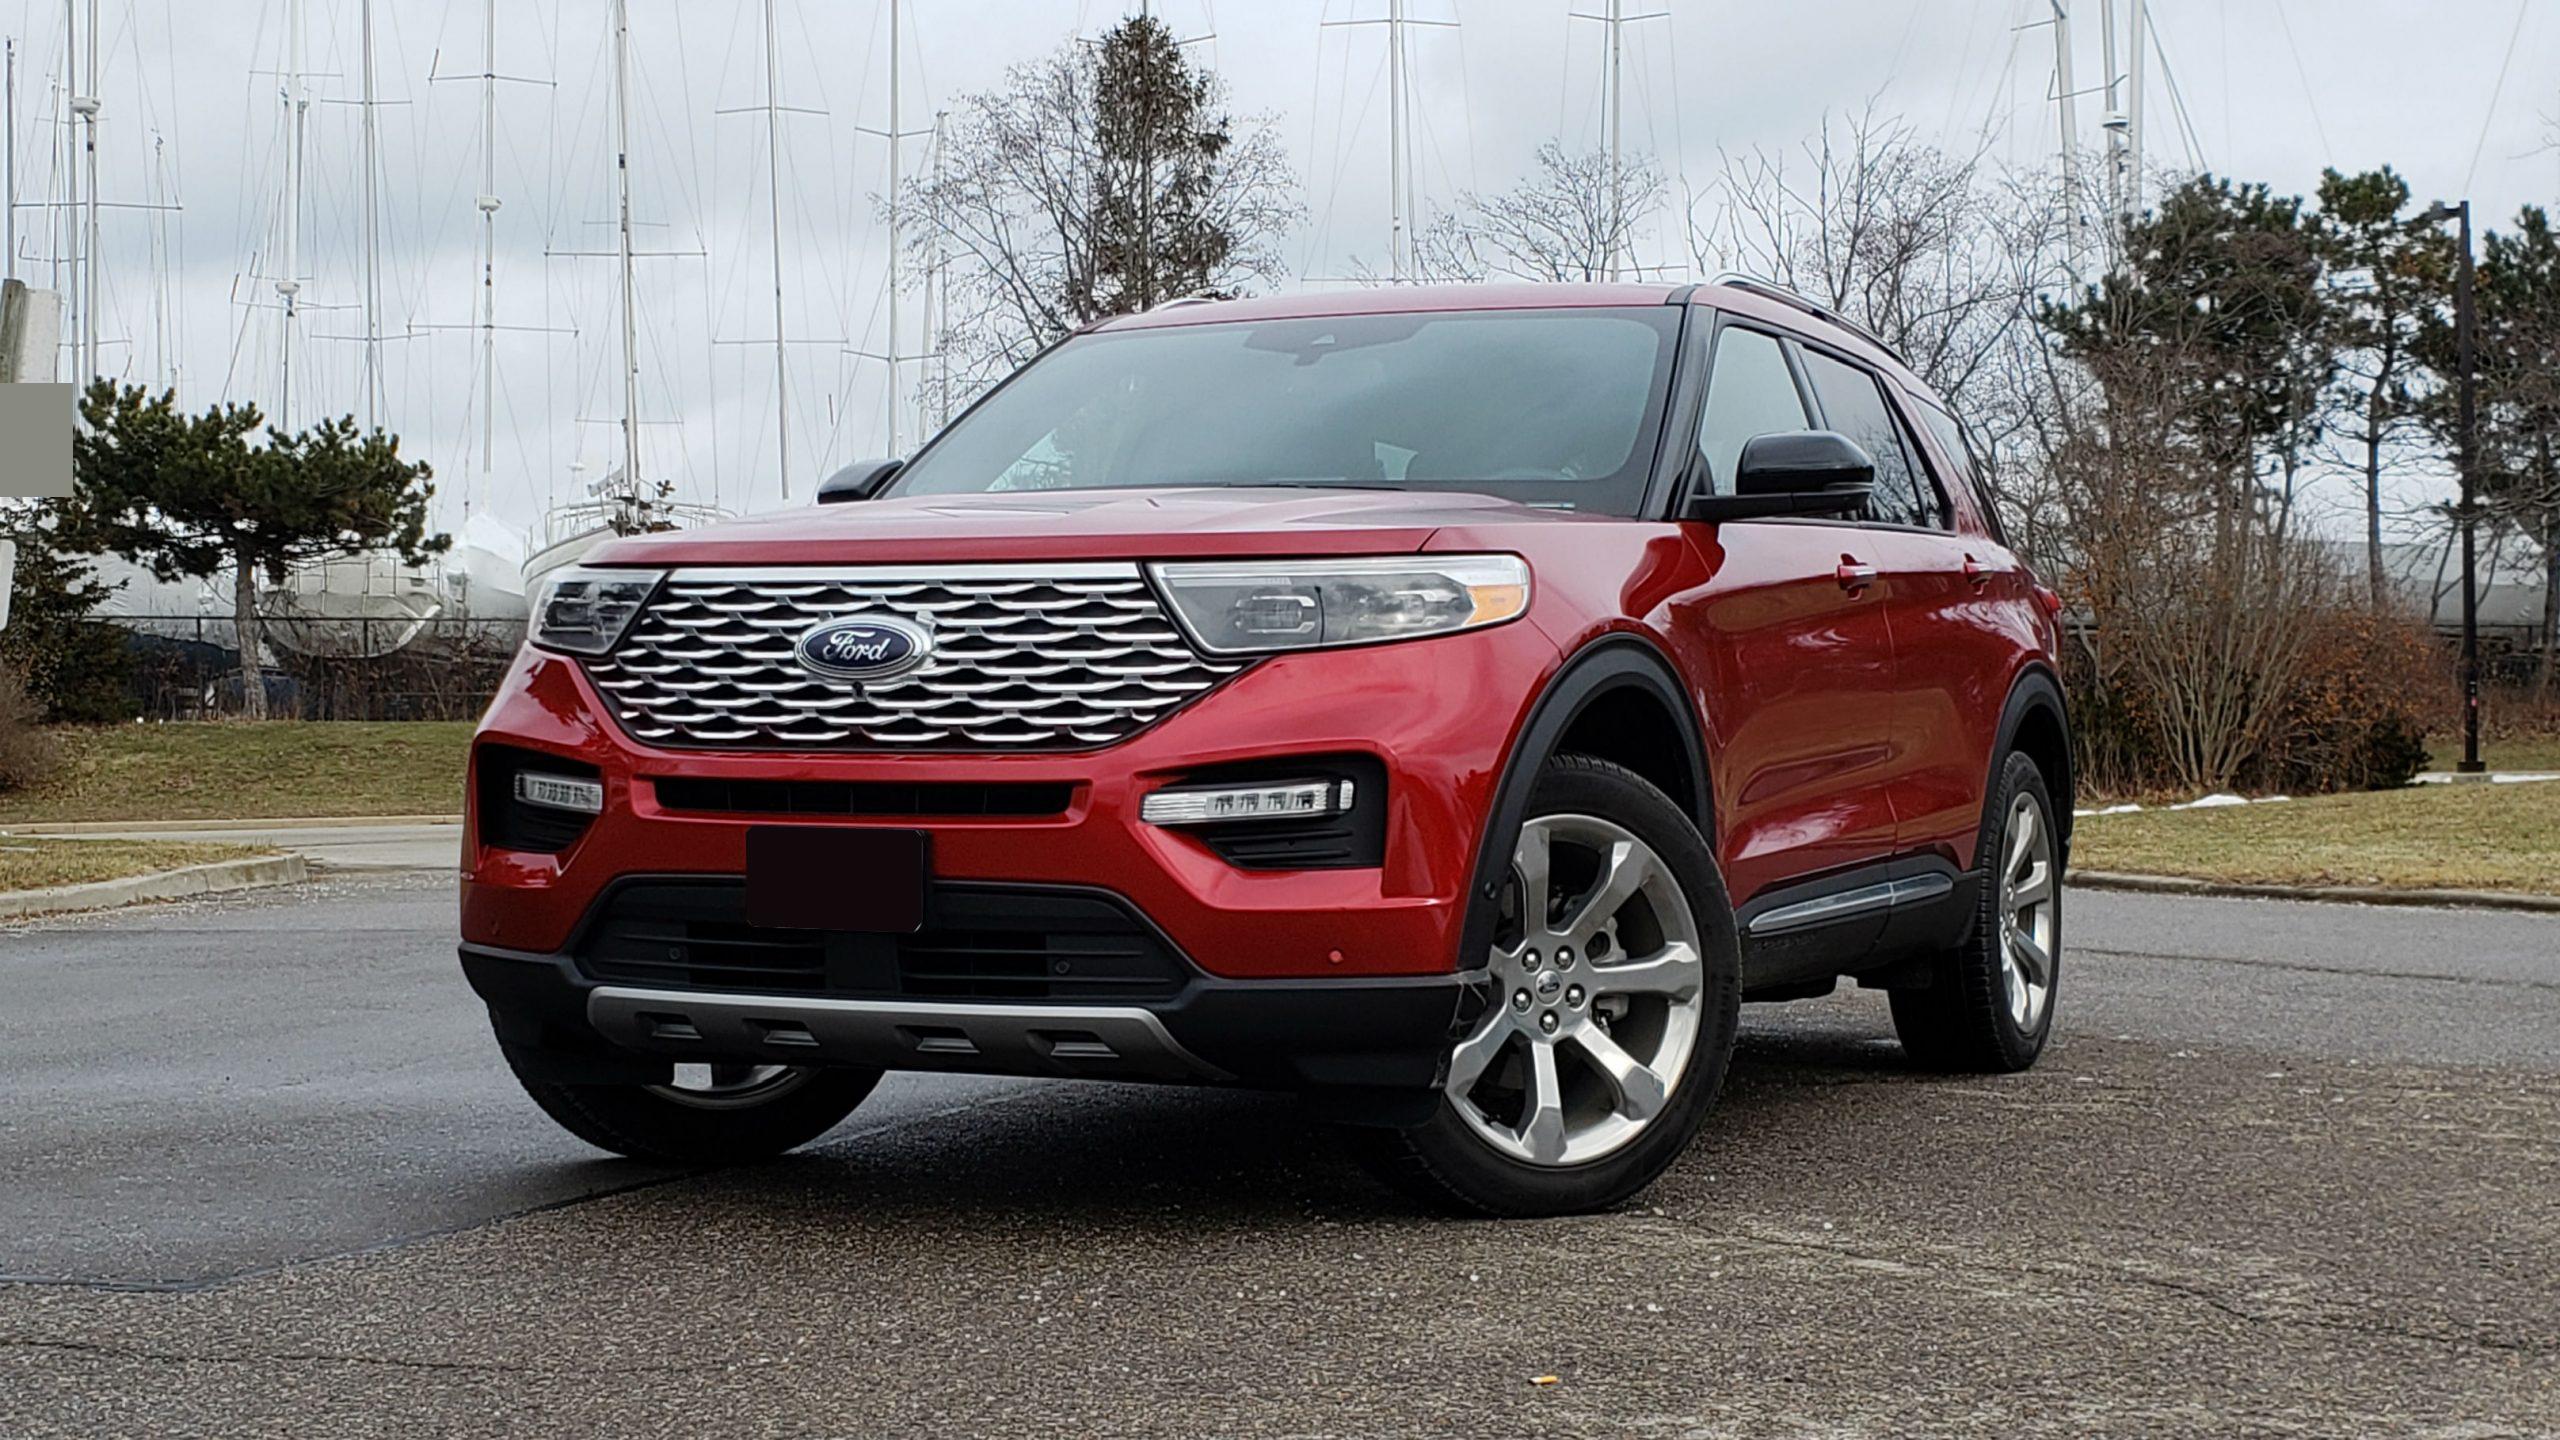 2022 Ford Explorer Platinum Lug Nut Torque Limited 4wd Cost